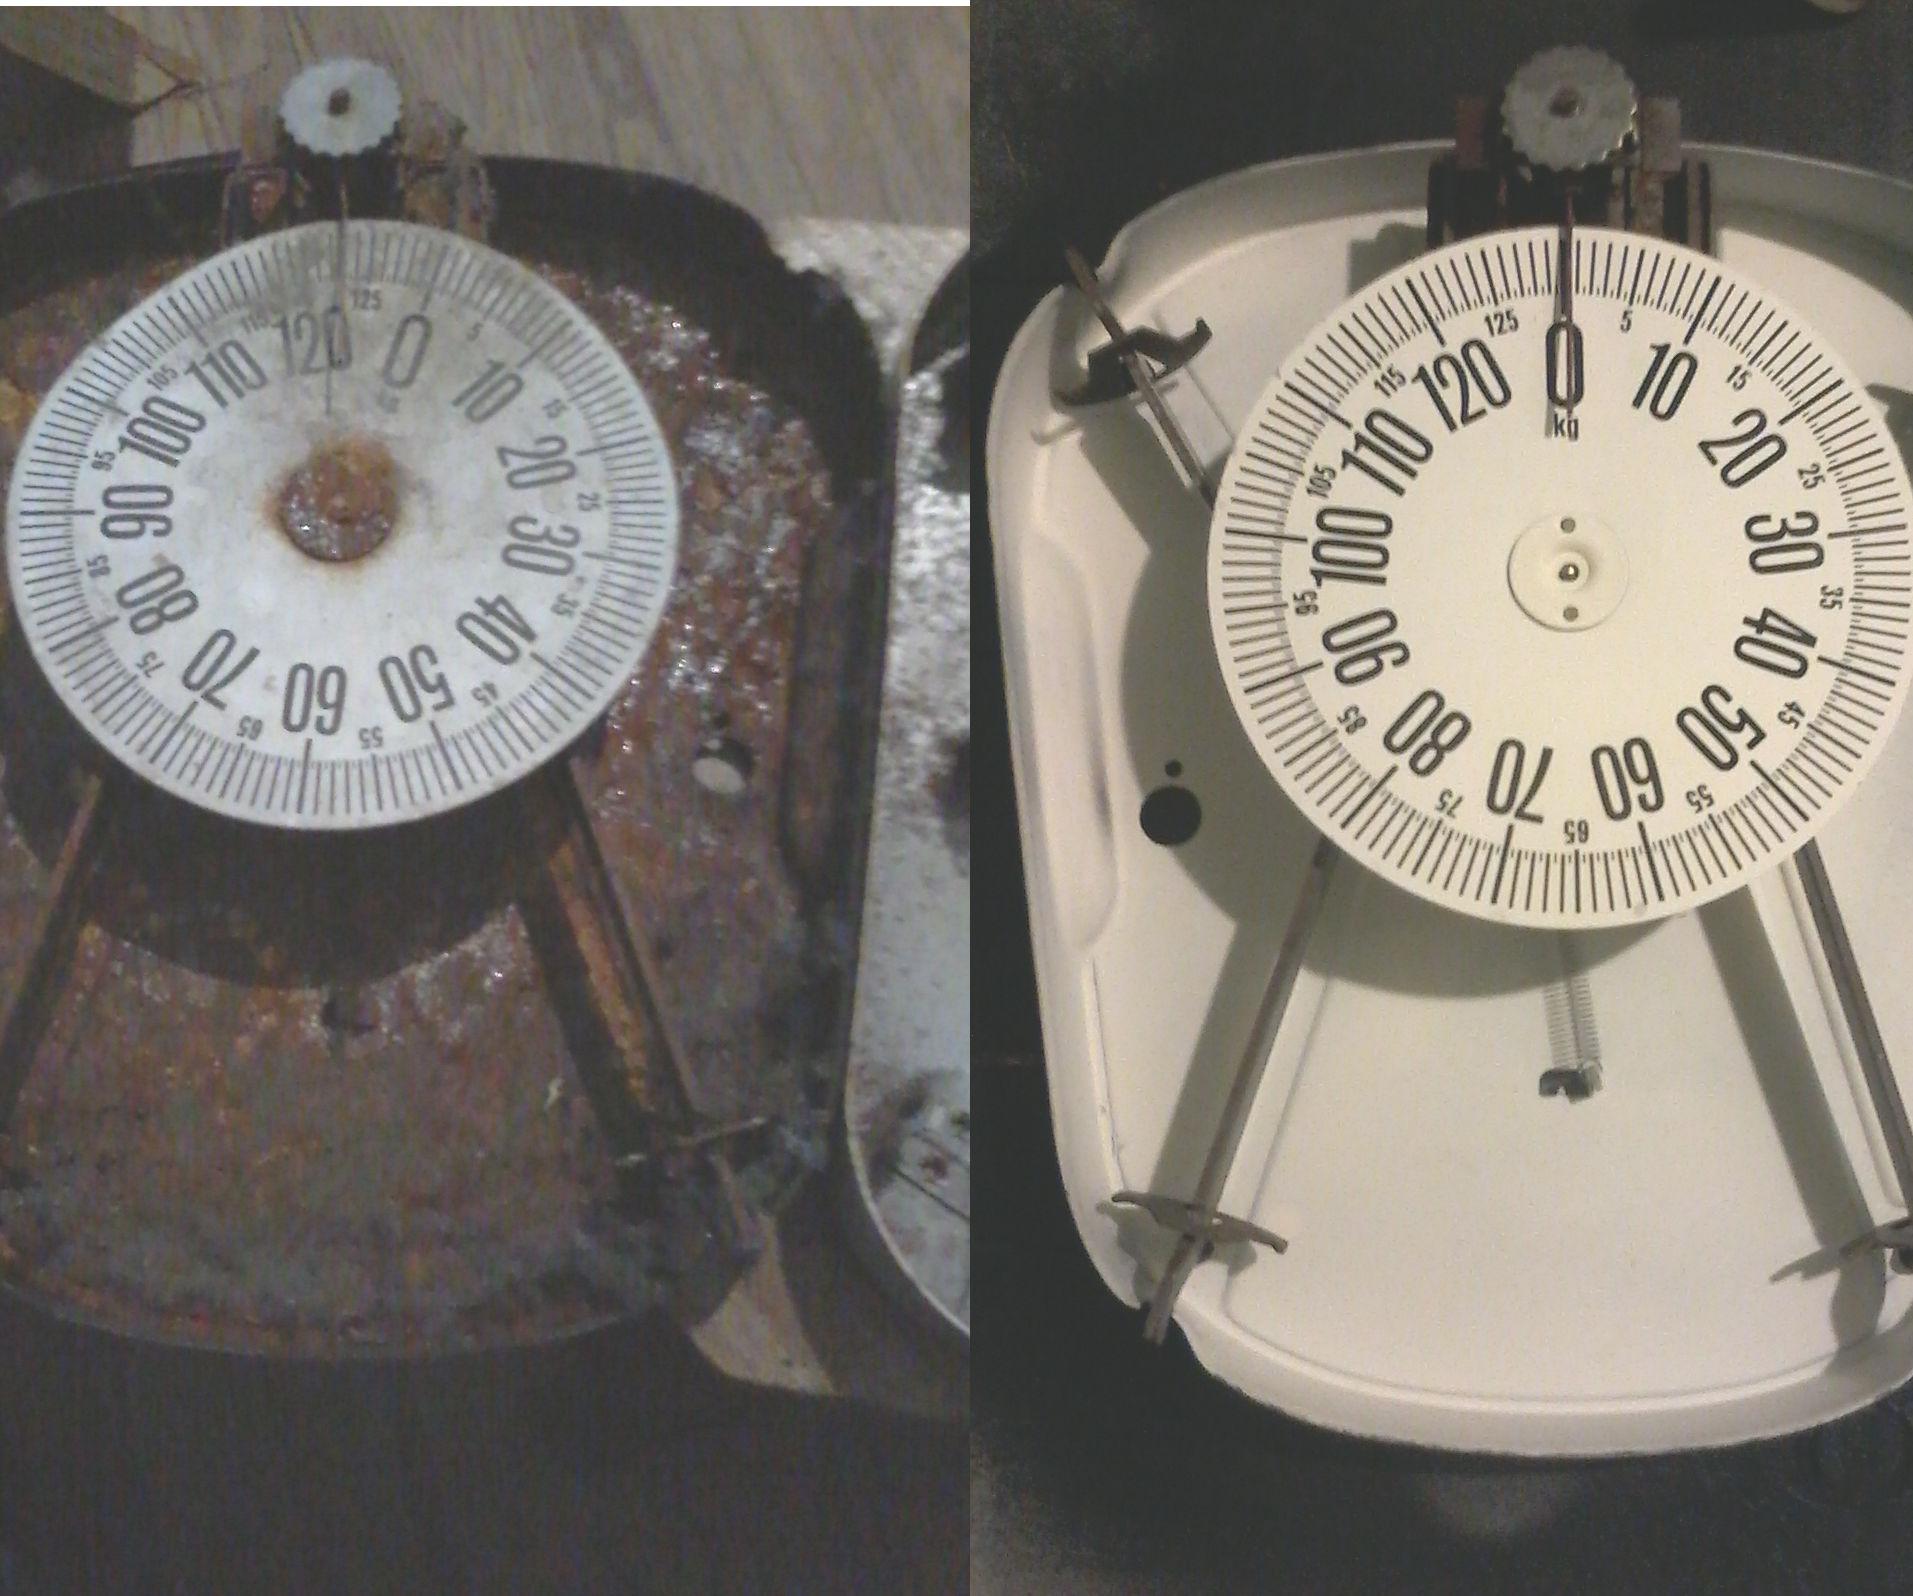 Restoring an analog bathroom scale.